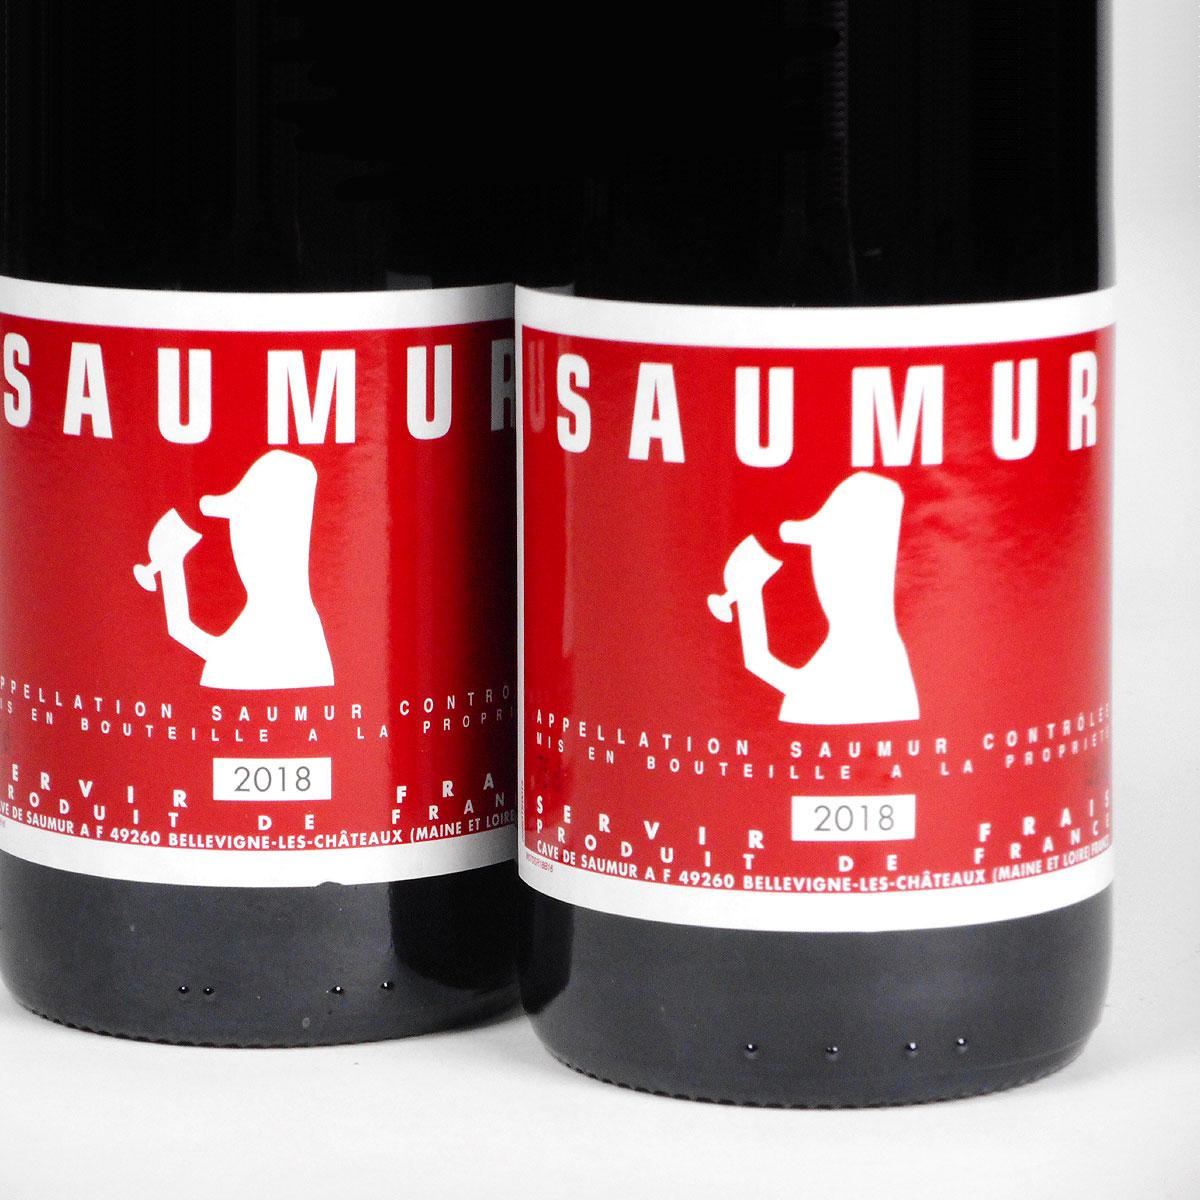 Saumur Rouge 2018